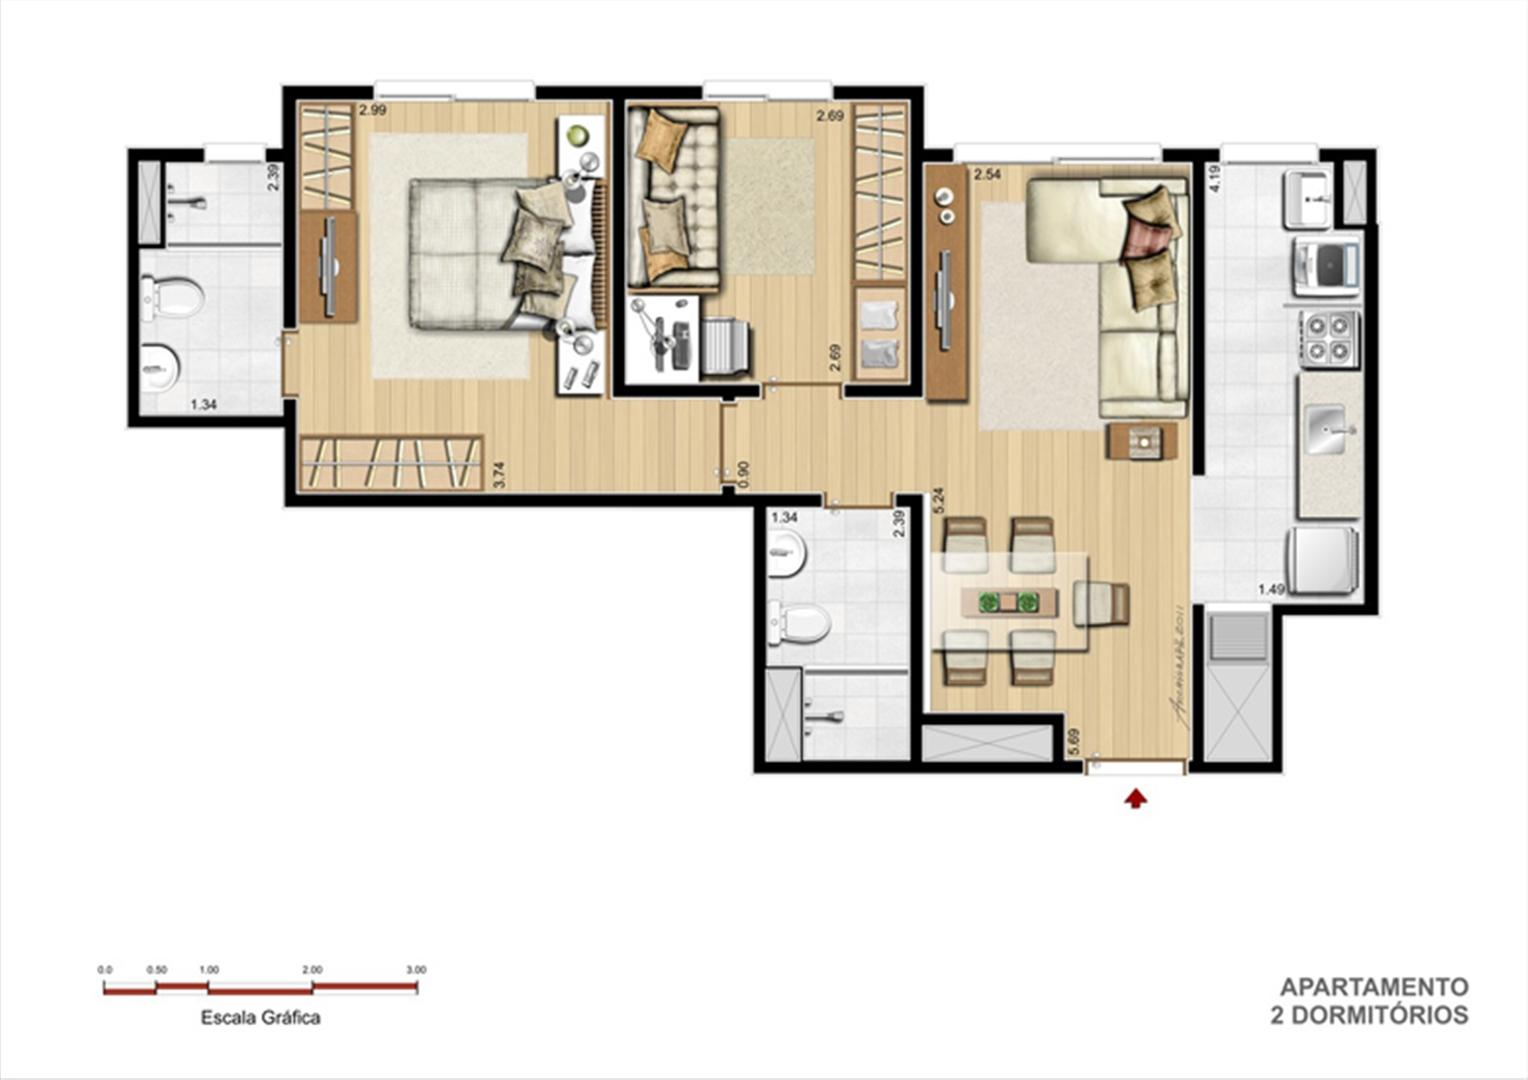 Terreo A - Tipo 2 dormitórios | Supera Condomínio Clube – Apartamento na  Cavalhada - Porto Alegre - Rio Grande do Sul